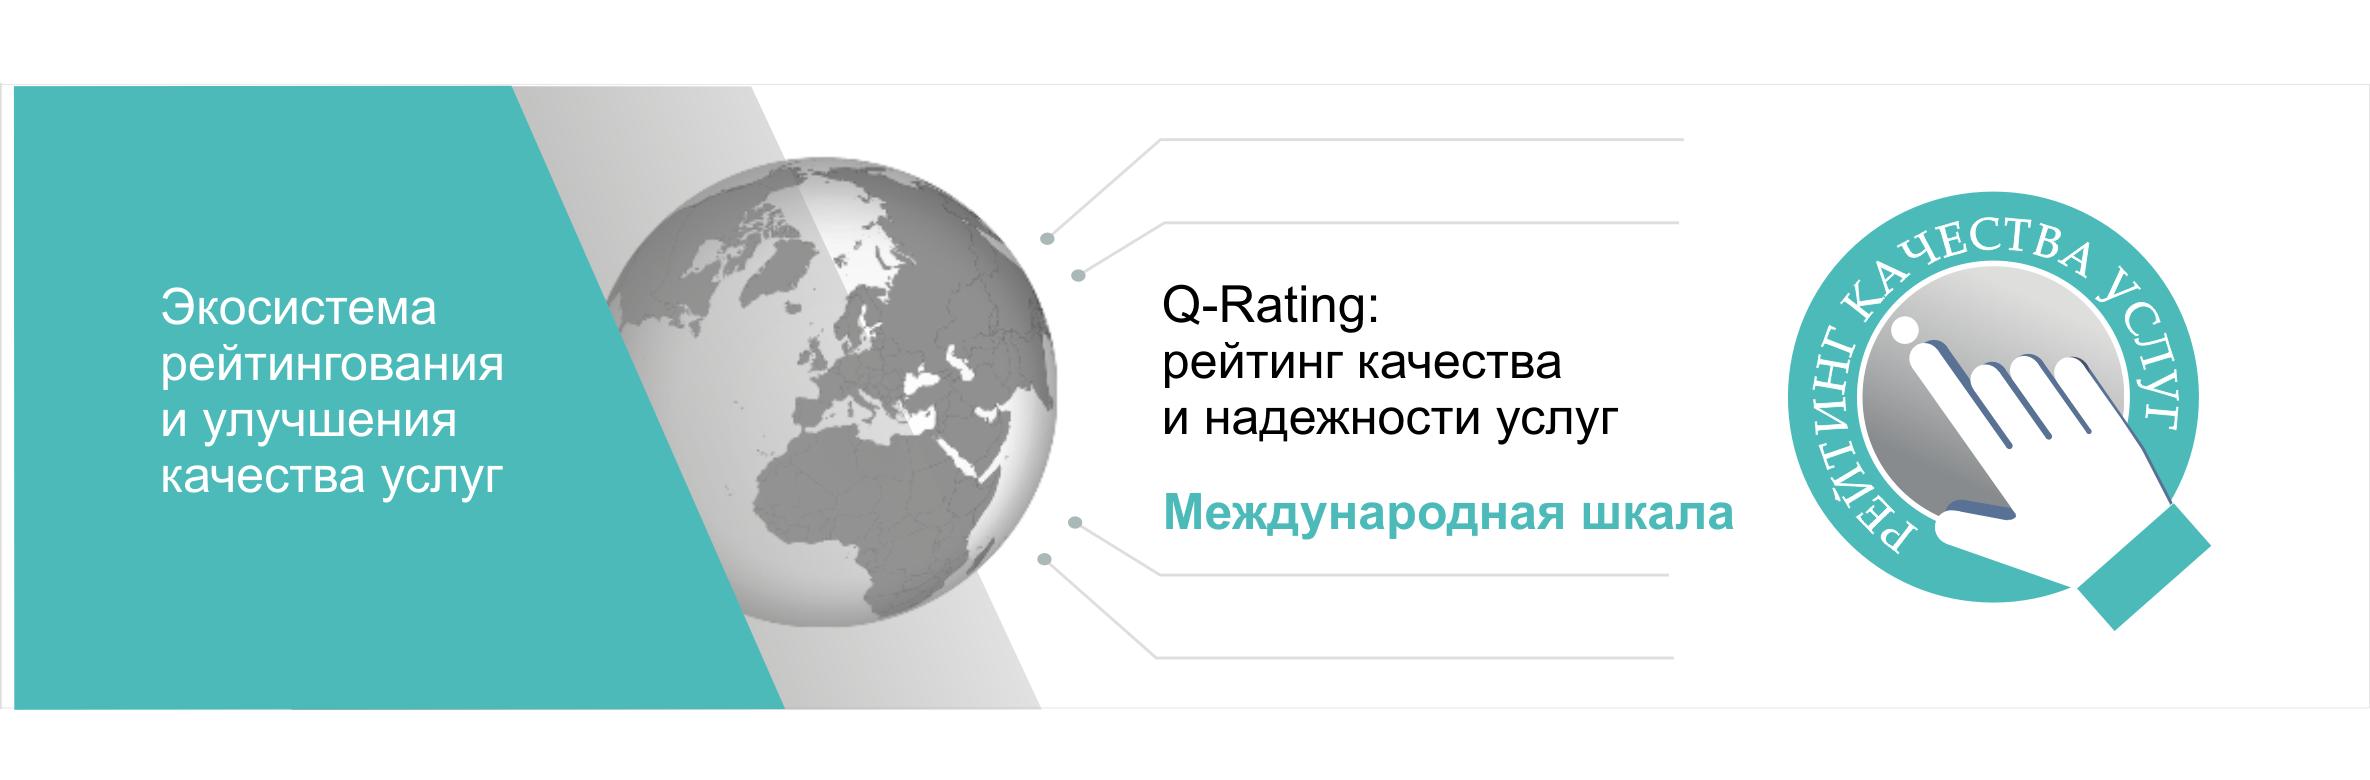 Международная шкала Q-Rating